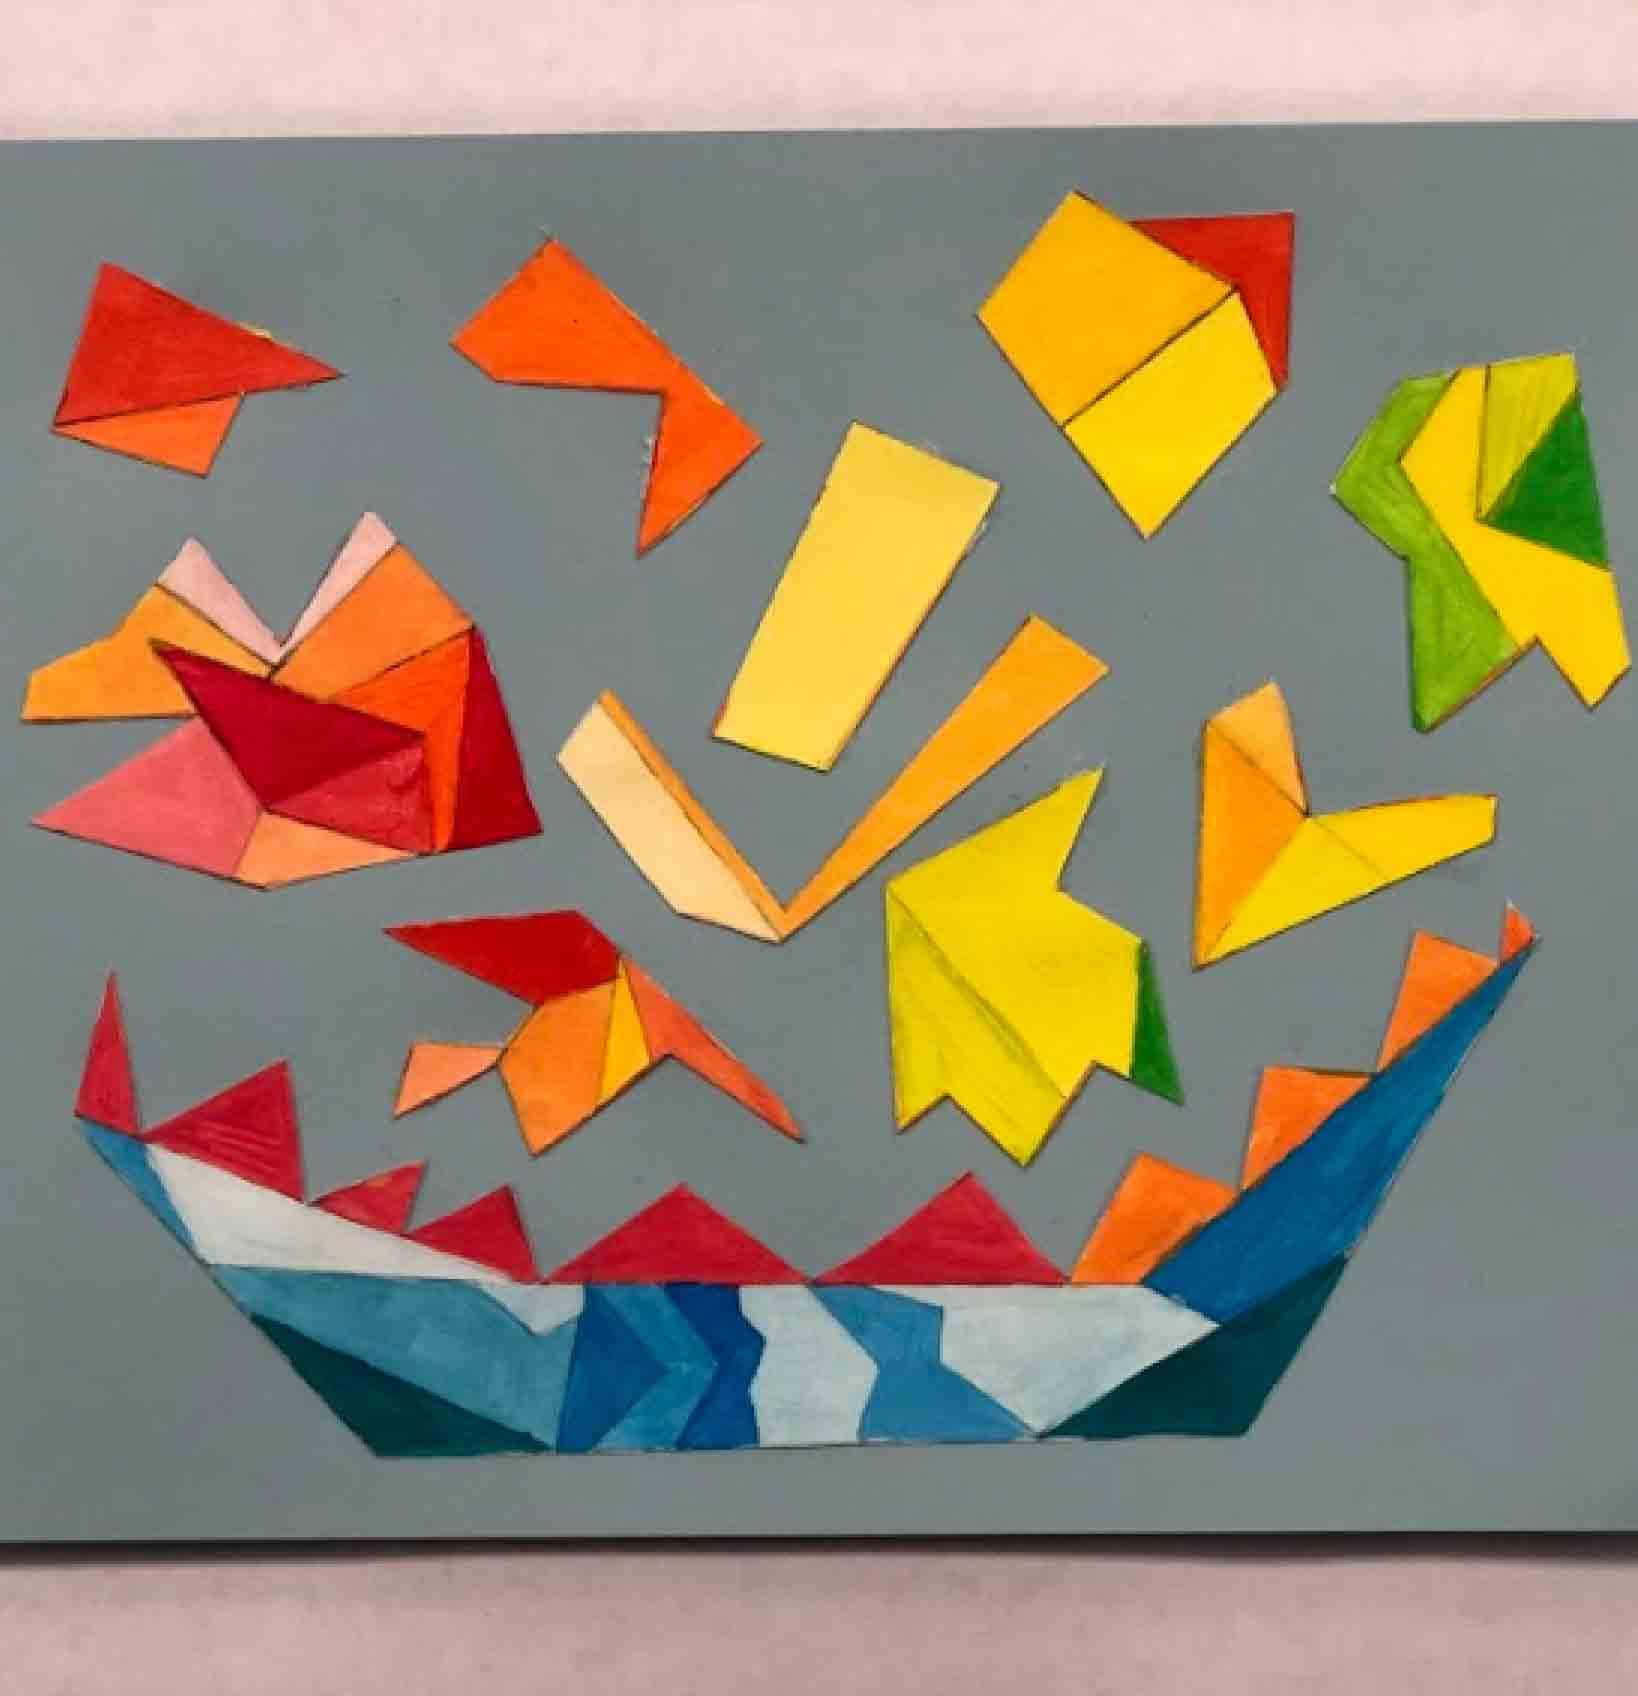 P.S. Arts Visual Art Geometric Shape Collage